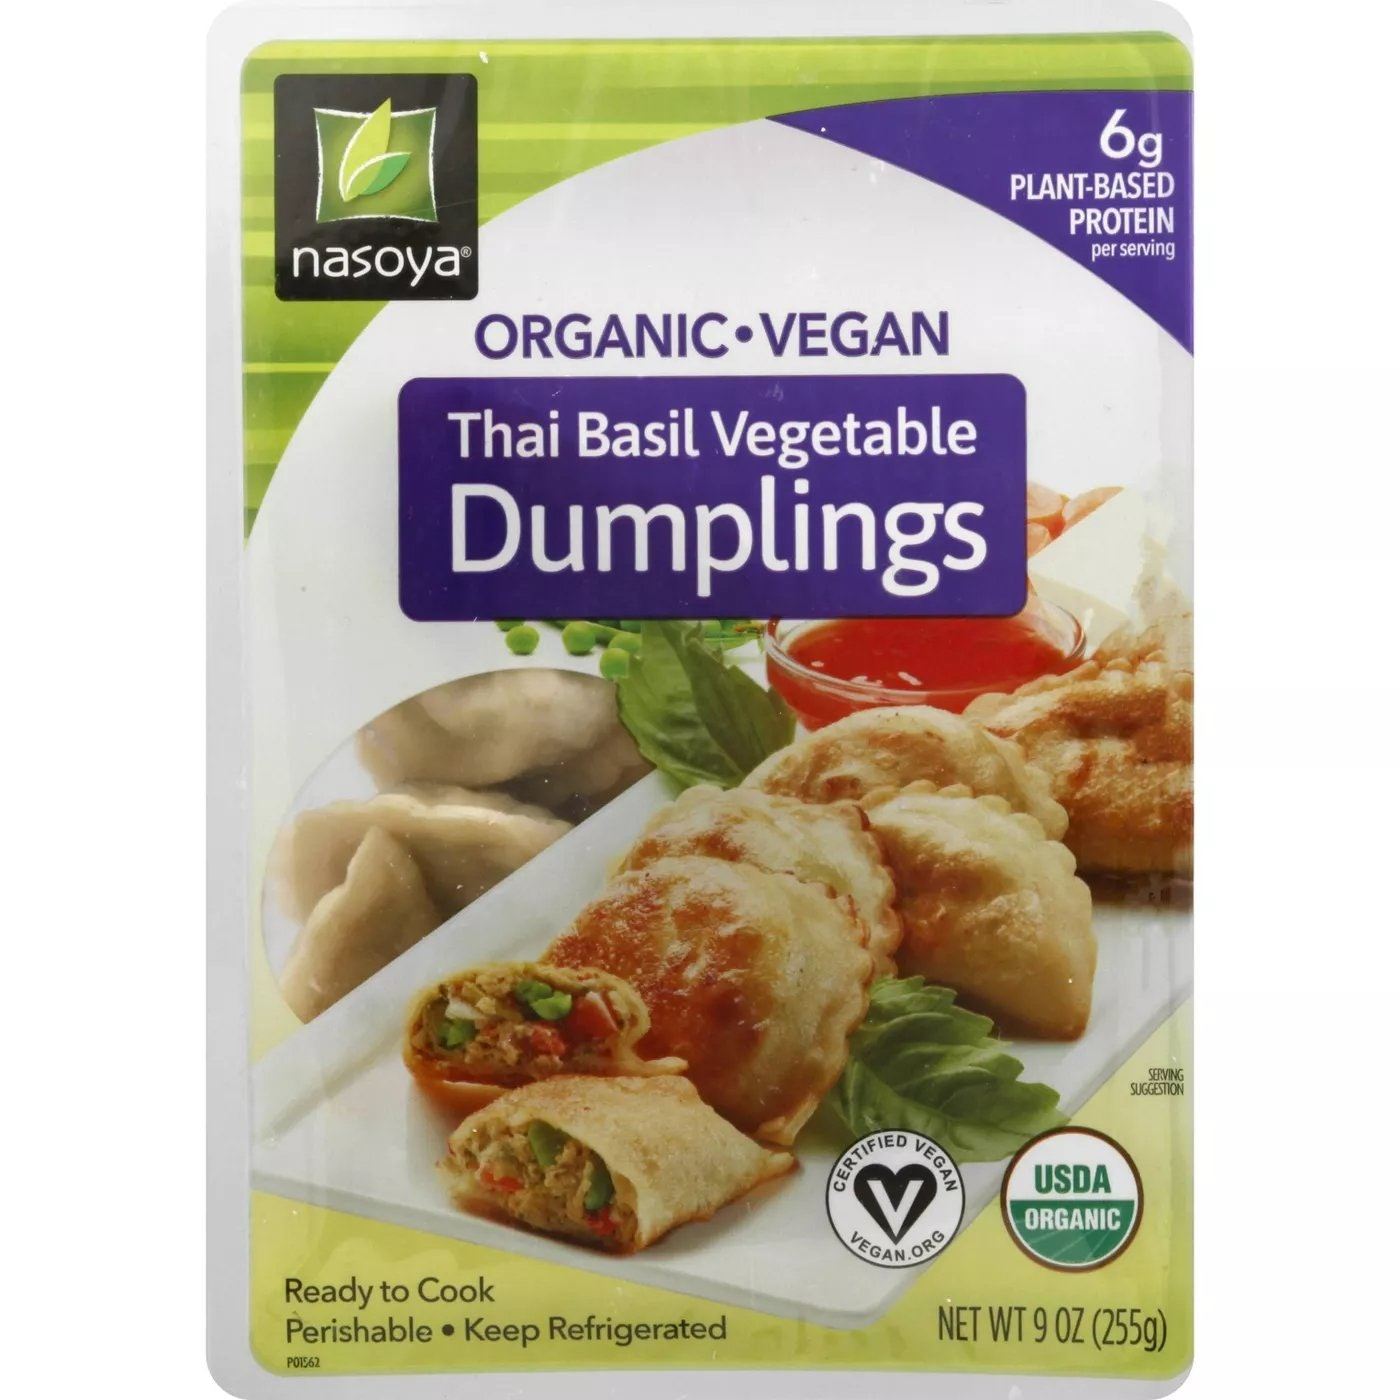 Nasoya Vegan Thai Basil Vegetable Dumplings